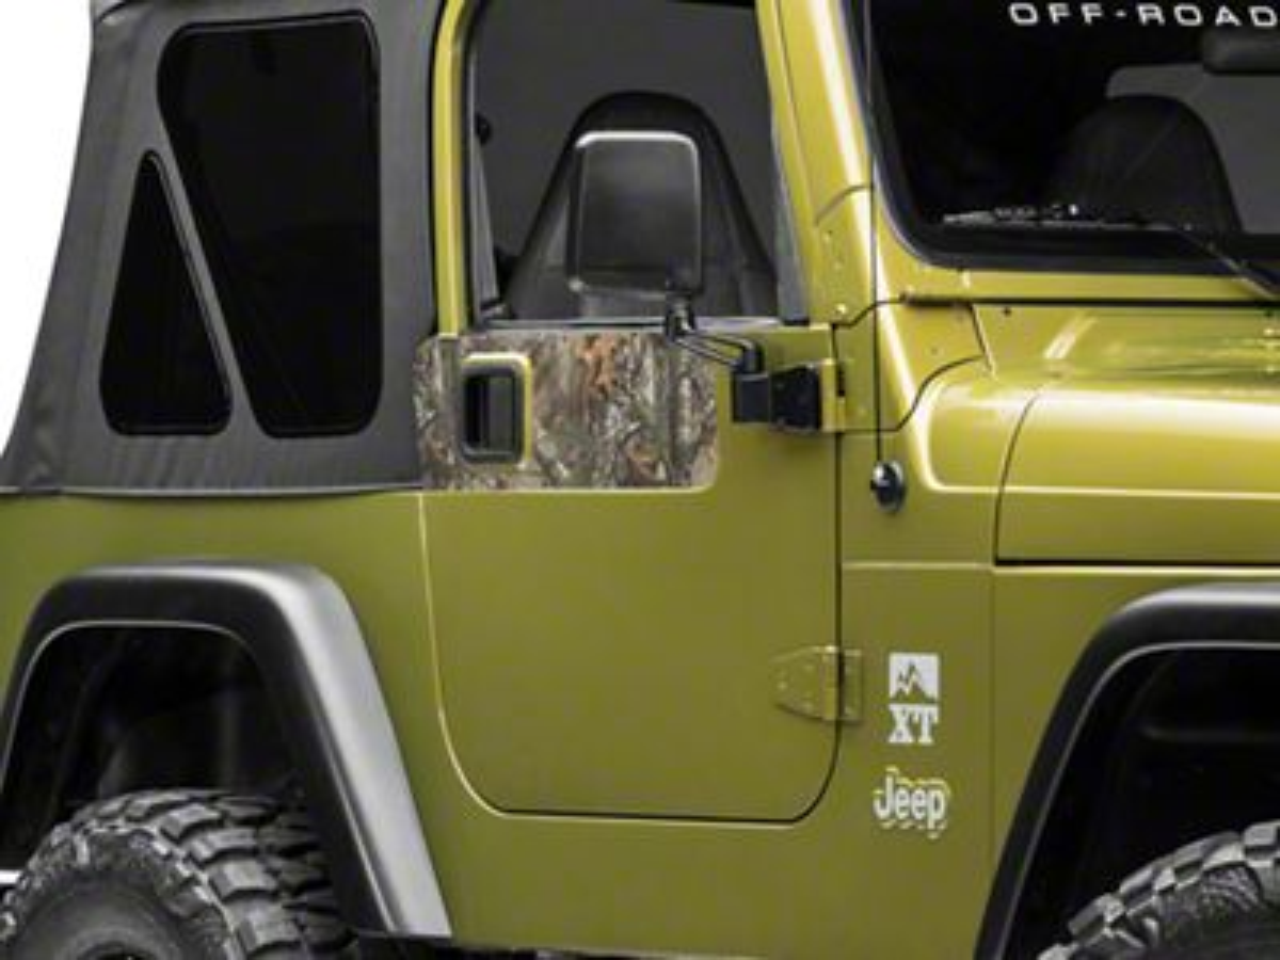 XT Graphics Door Accents - Real Tree (97-06 Jeep Wrangler TJ)